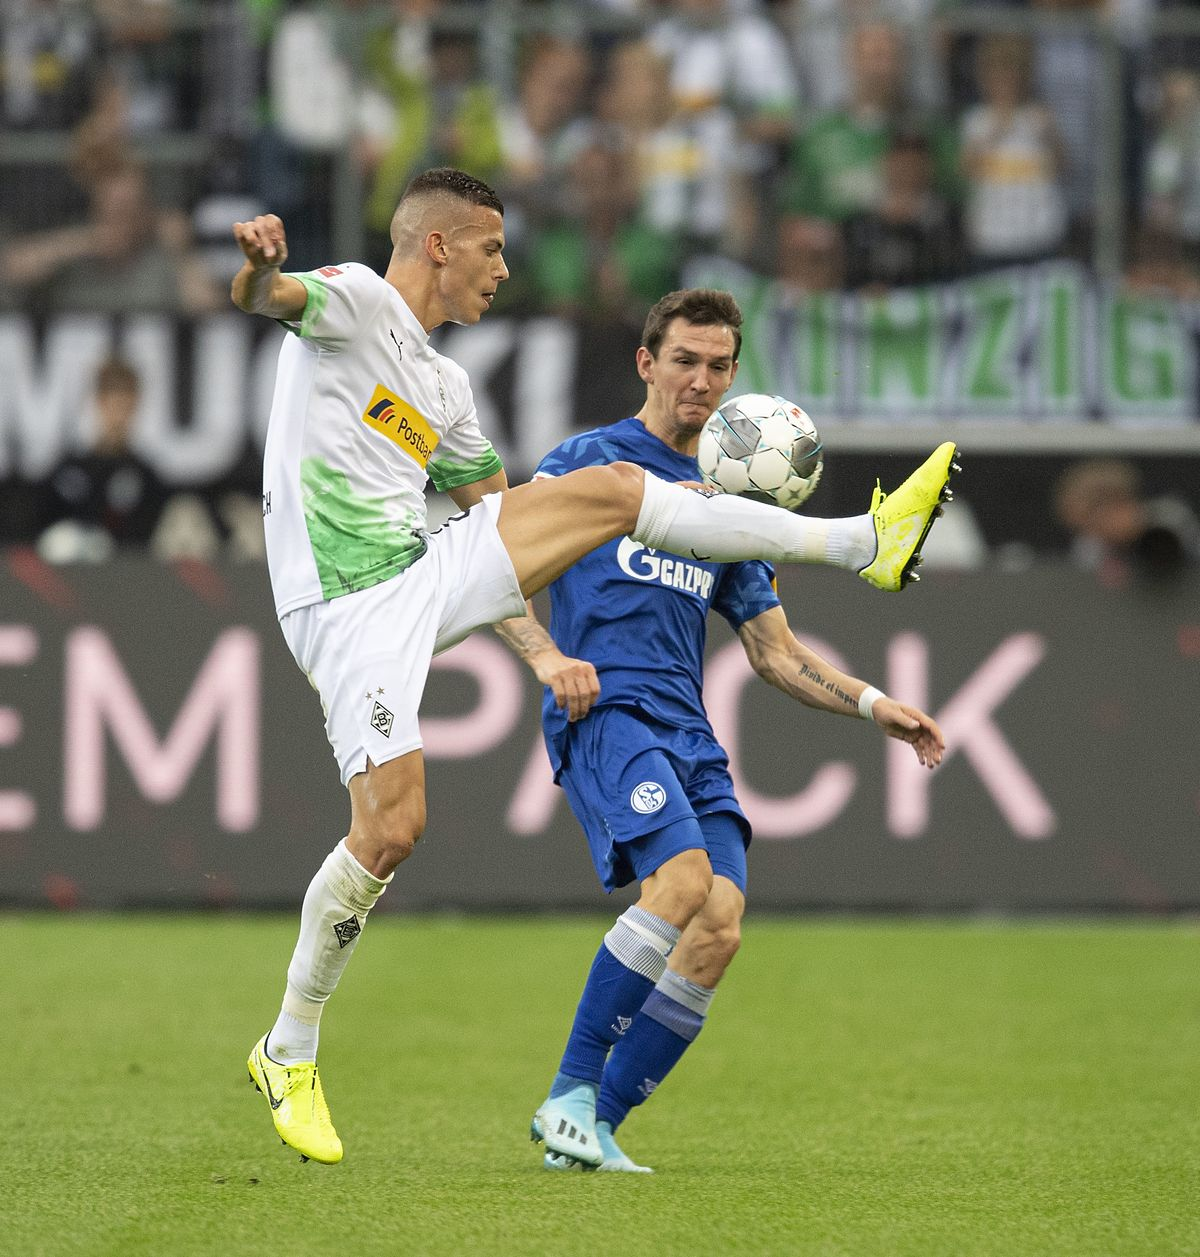 László Bénes (Borussia Mönchengladbach) im Zweikampf mit Benito Raman (FC Schalke 04).  <br>(ddp images)